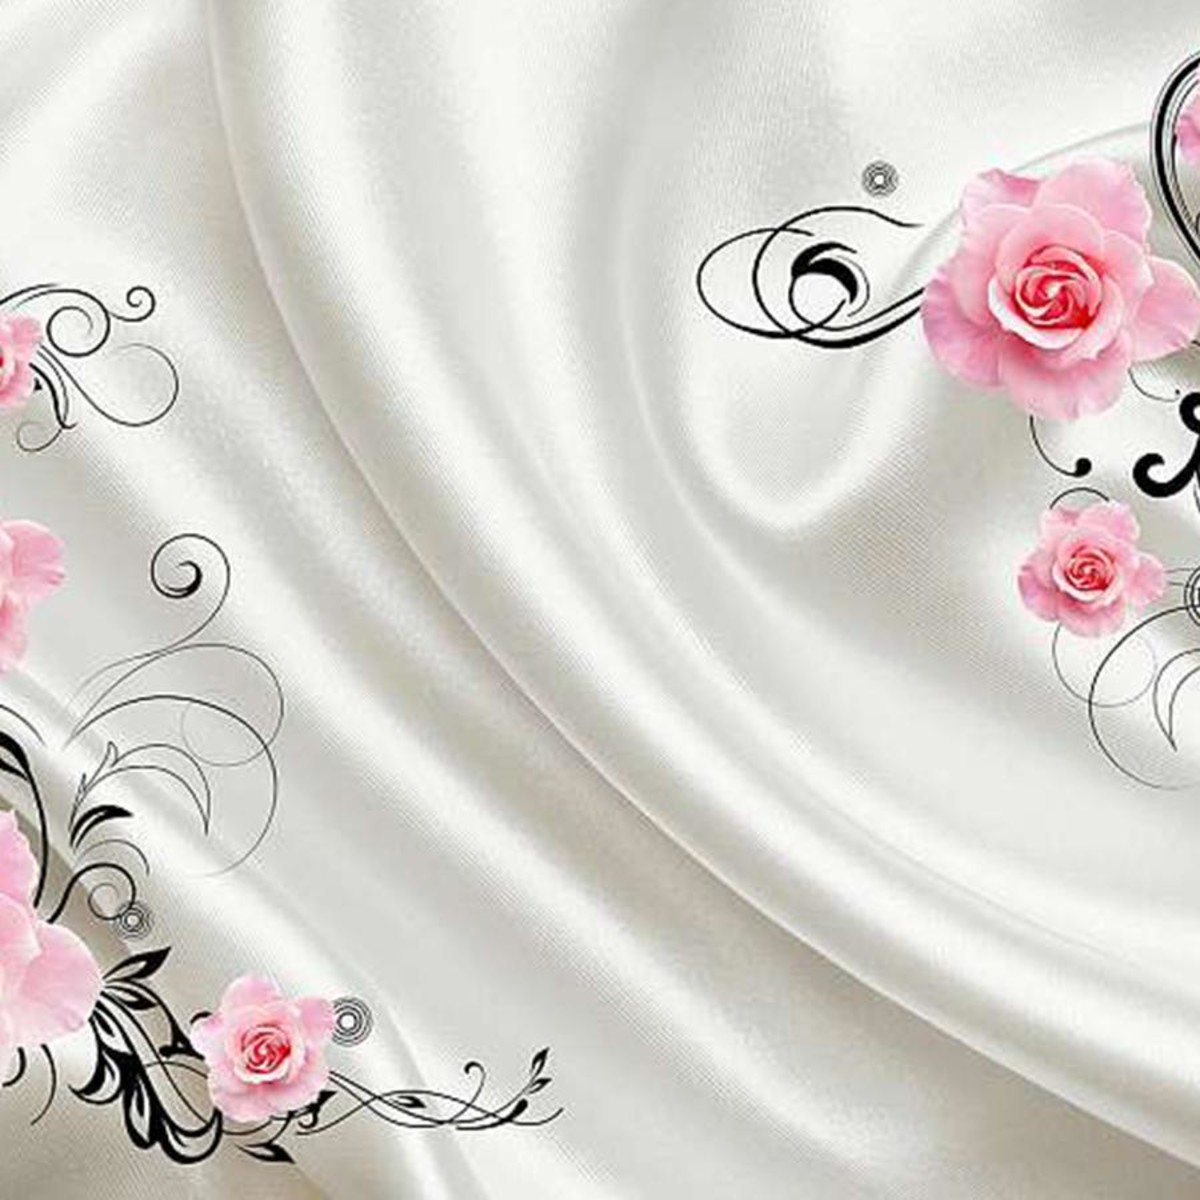 Фотообои Divino Decor Шелк и розы L-062 400х270 см